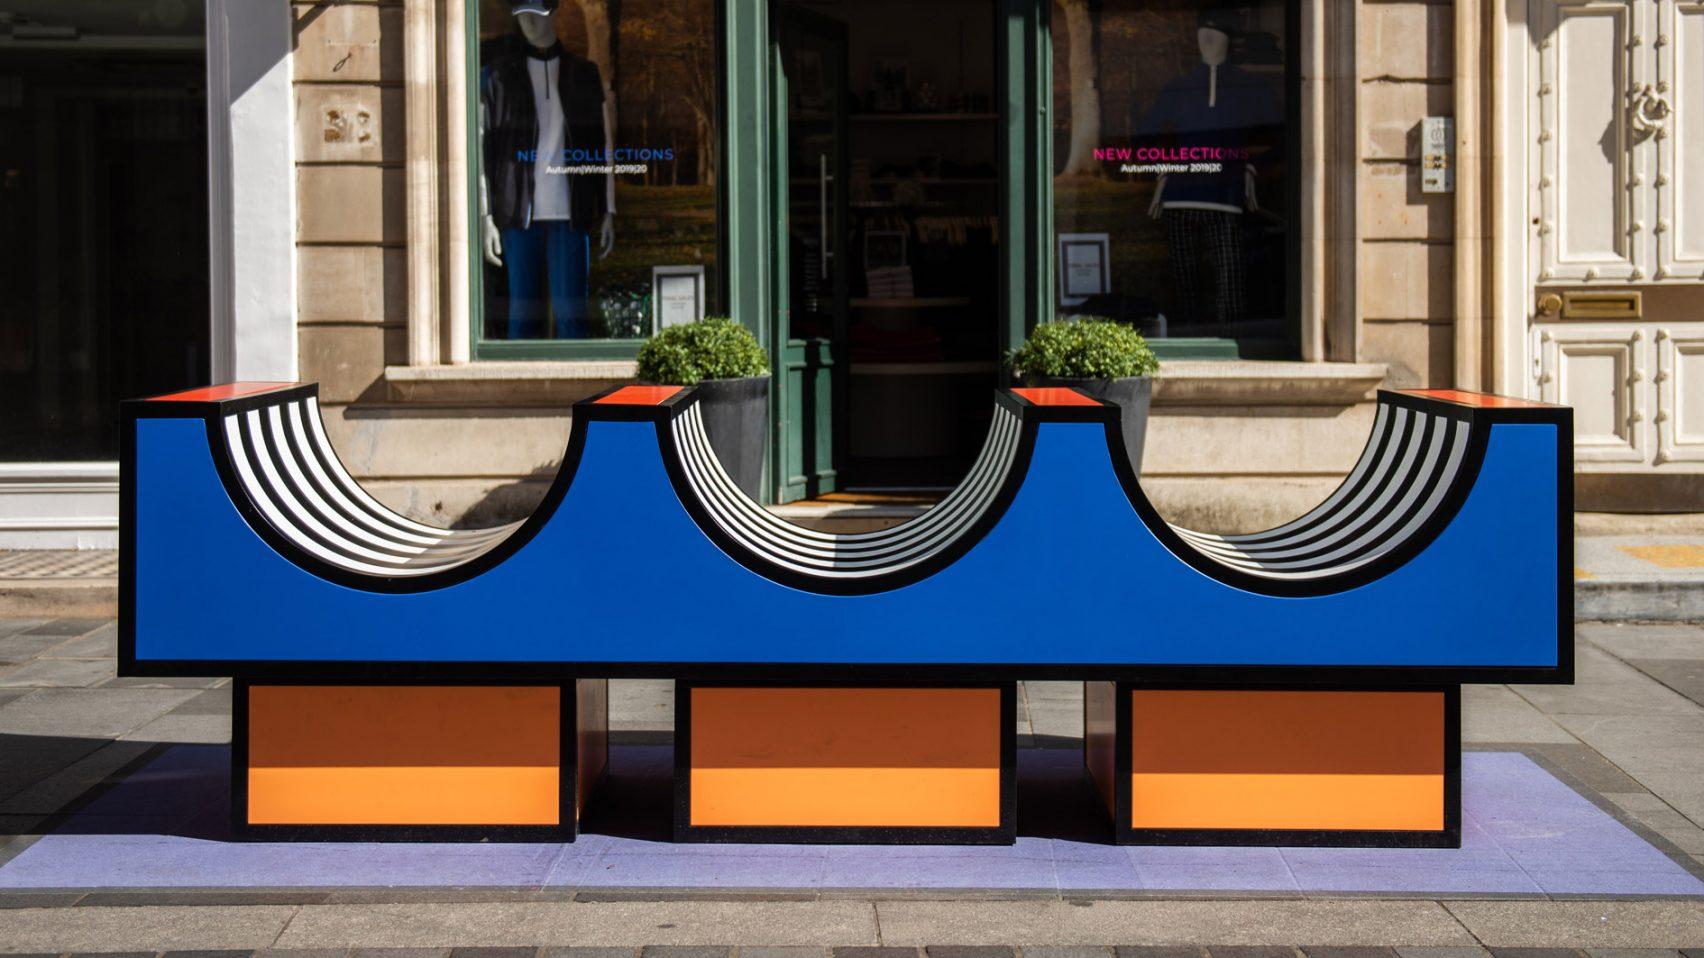 camille-walala-London-Design4